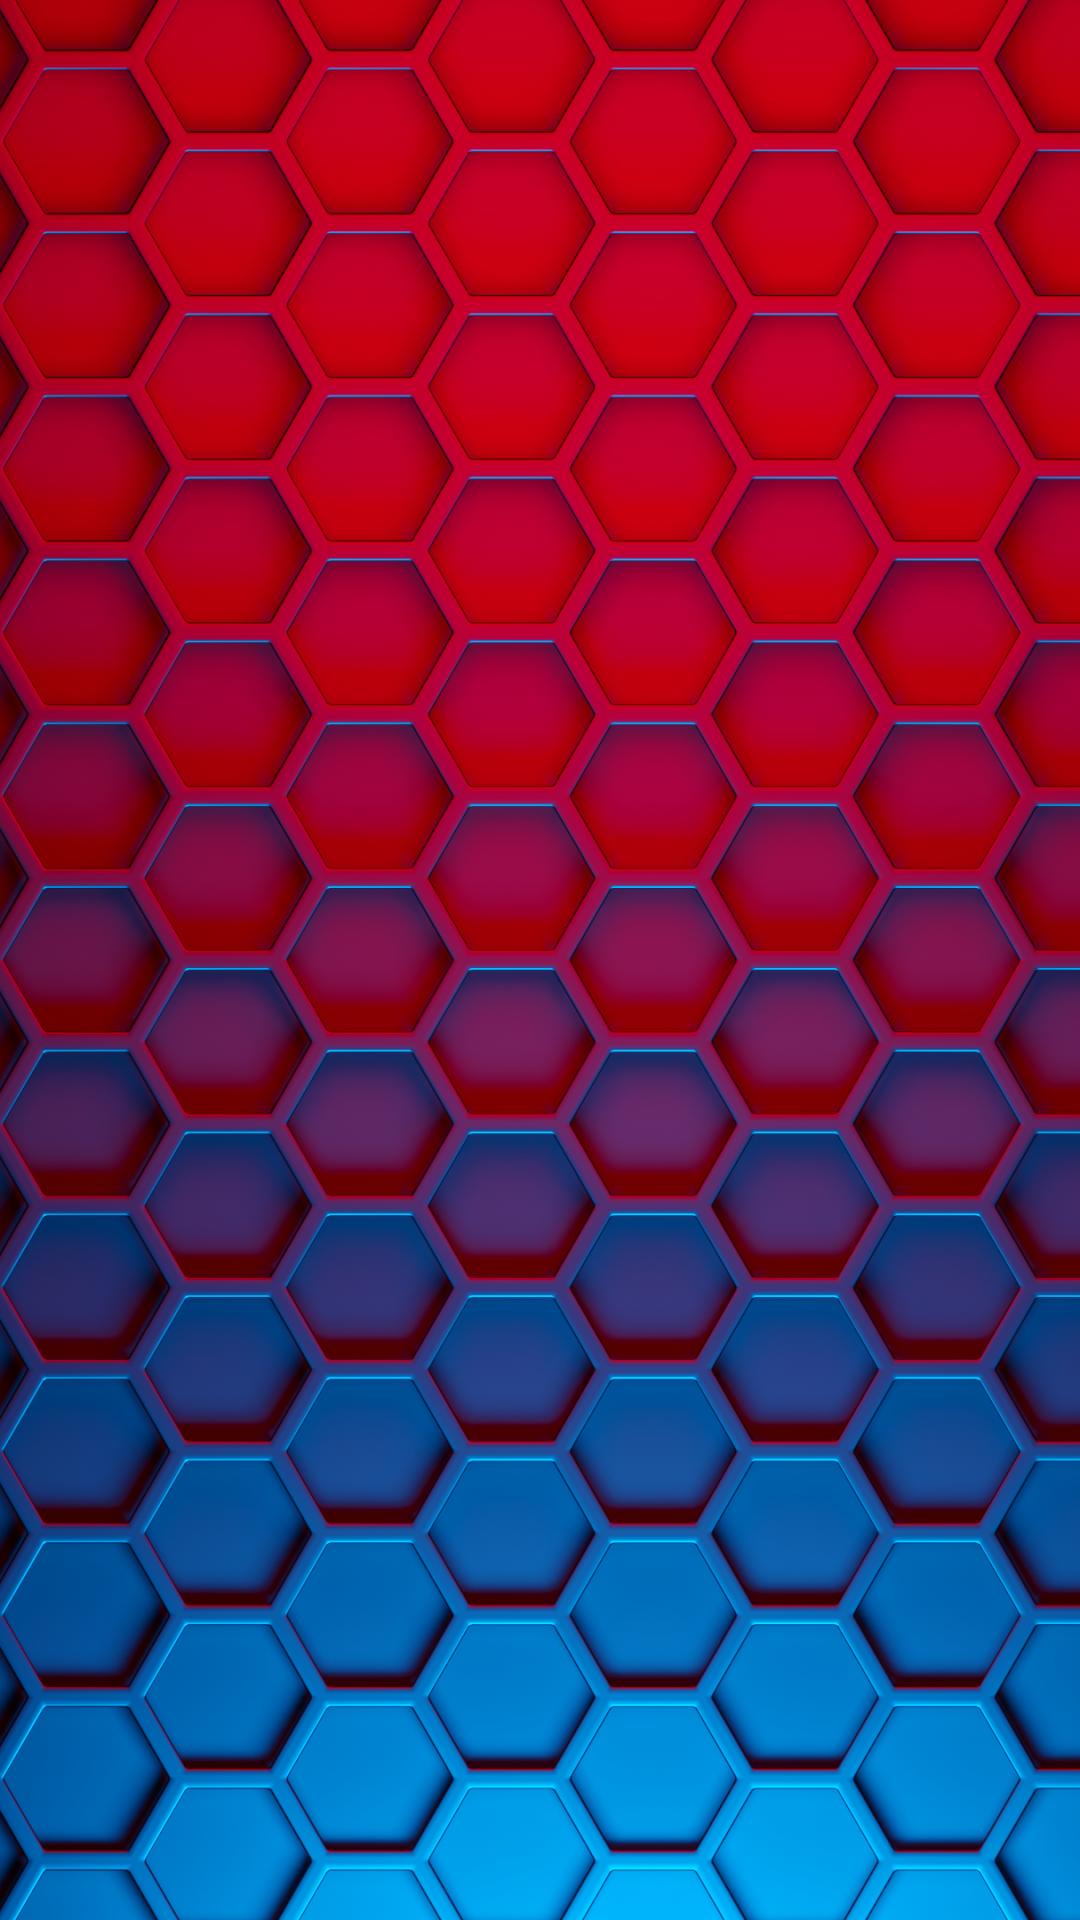 Wallpaper 887531